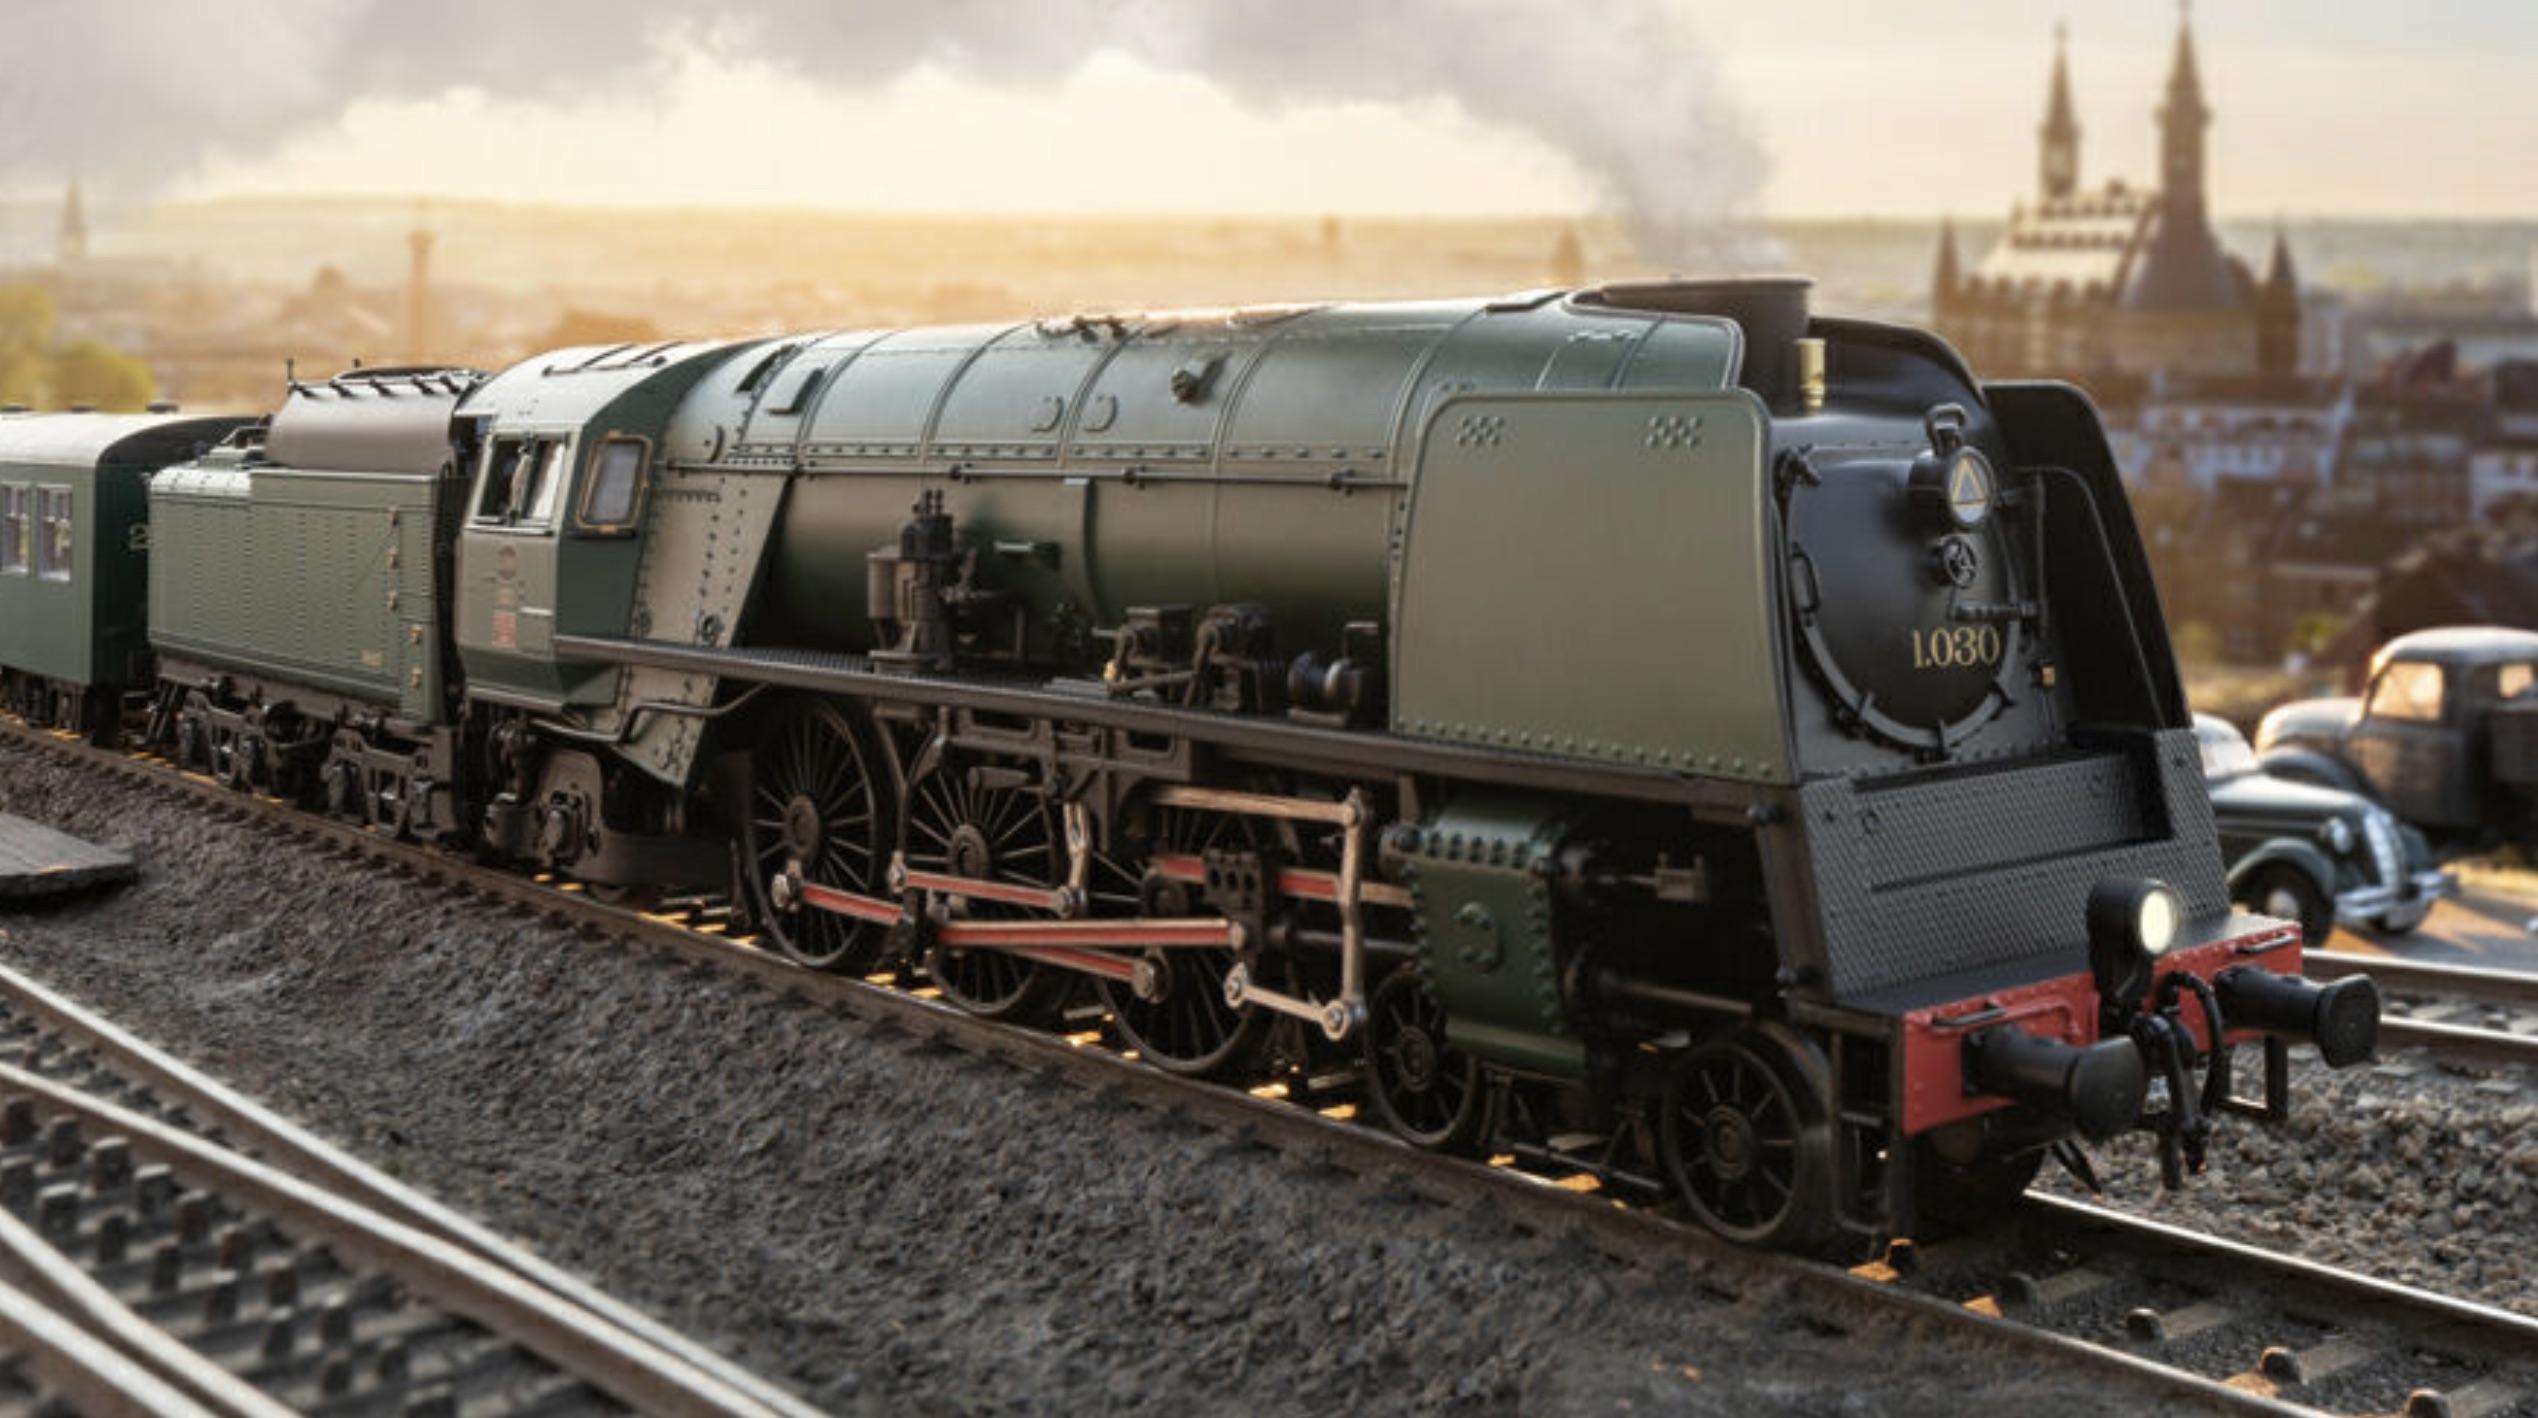 Marklin Trix HO 'Surprise' Loco for 2020 - SNCB Class 1 Steam Locomotive